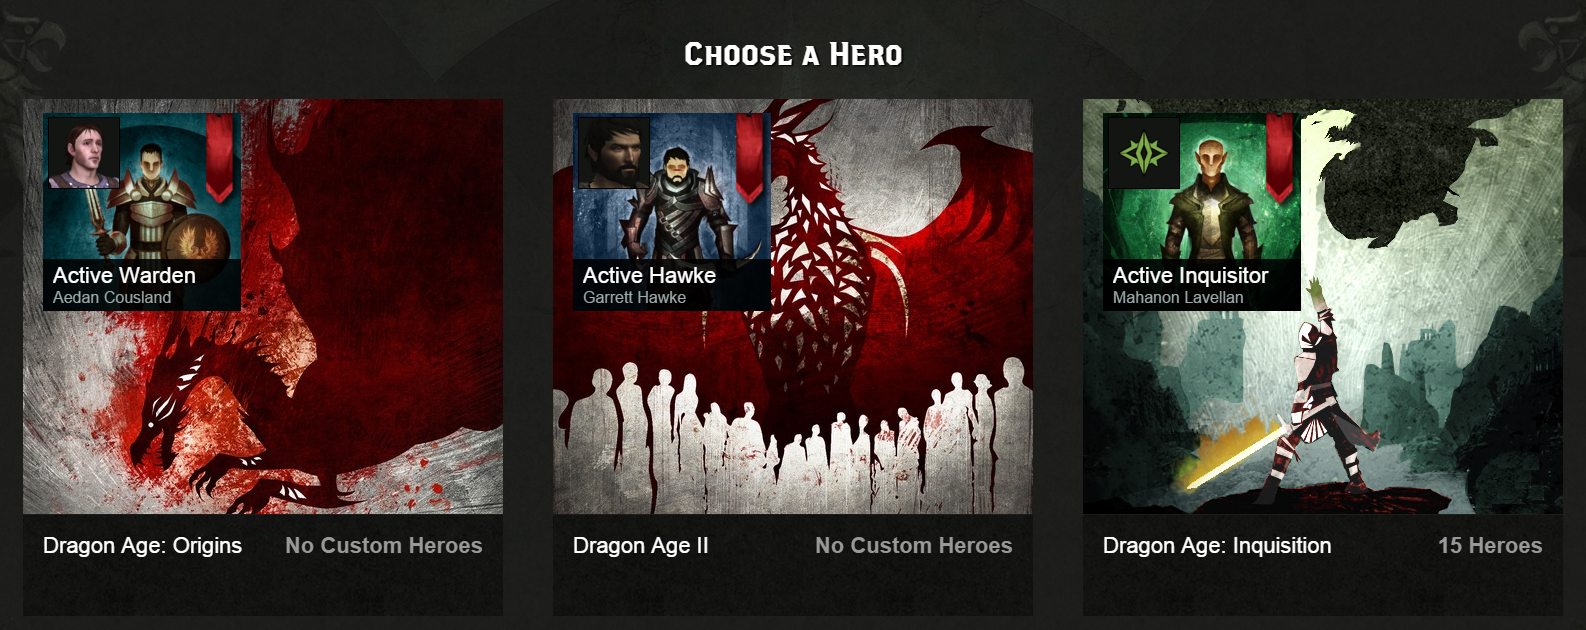 Hero choose